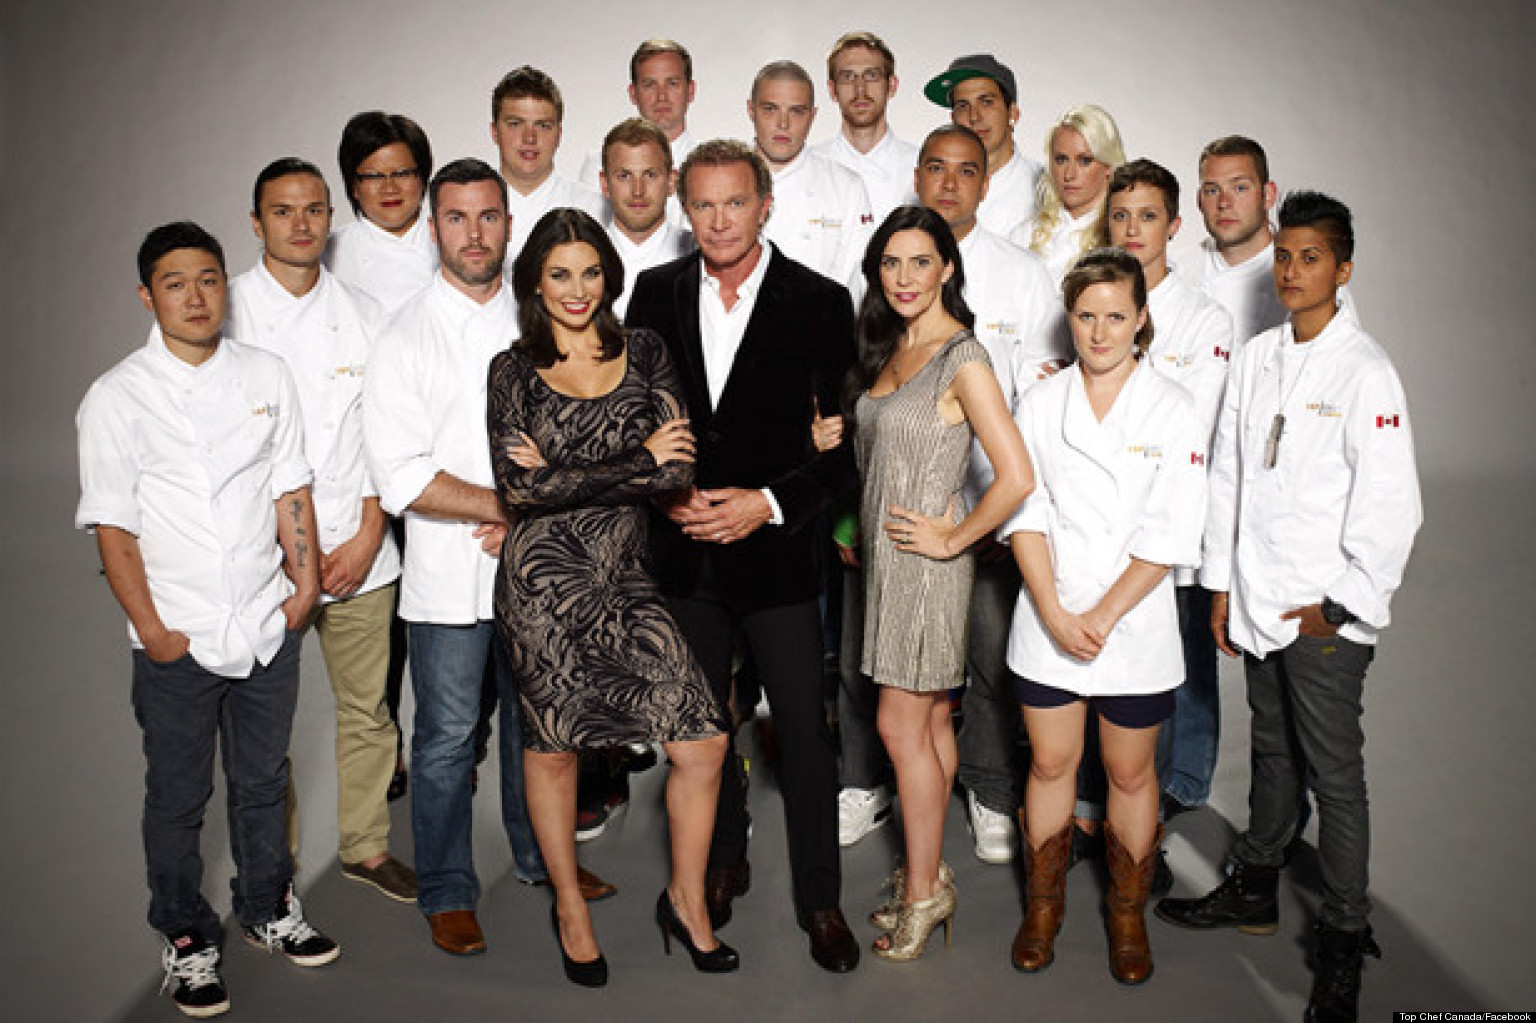 Top Chef: Top Chef Canada: Who Are Season 3's Contestants And Where